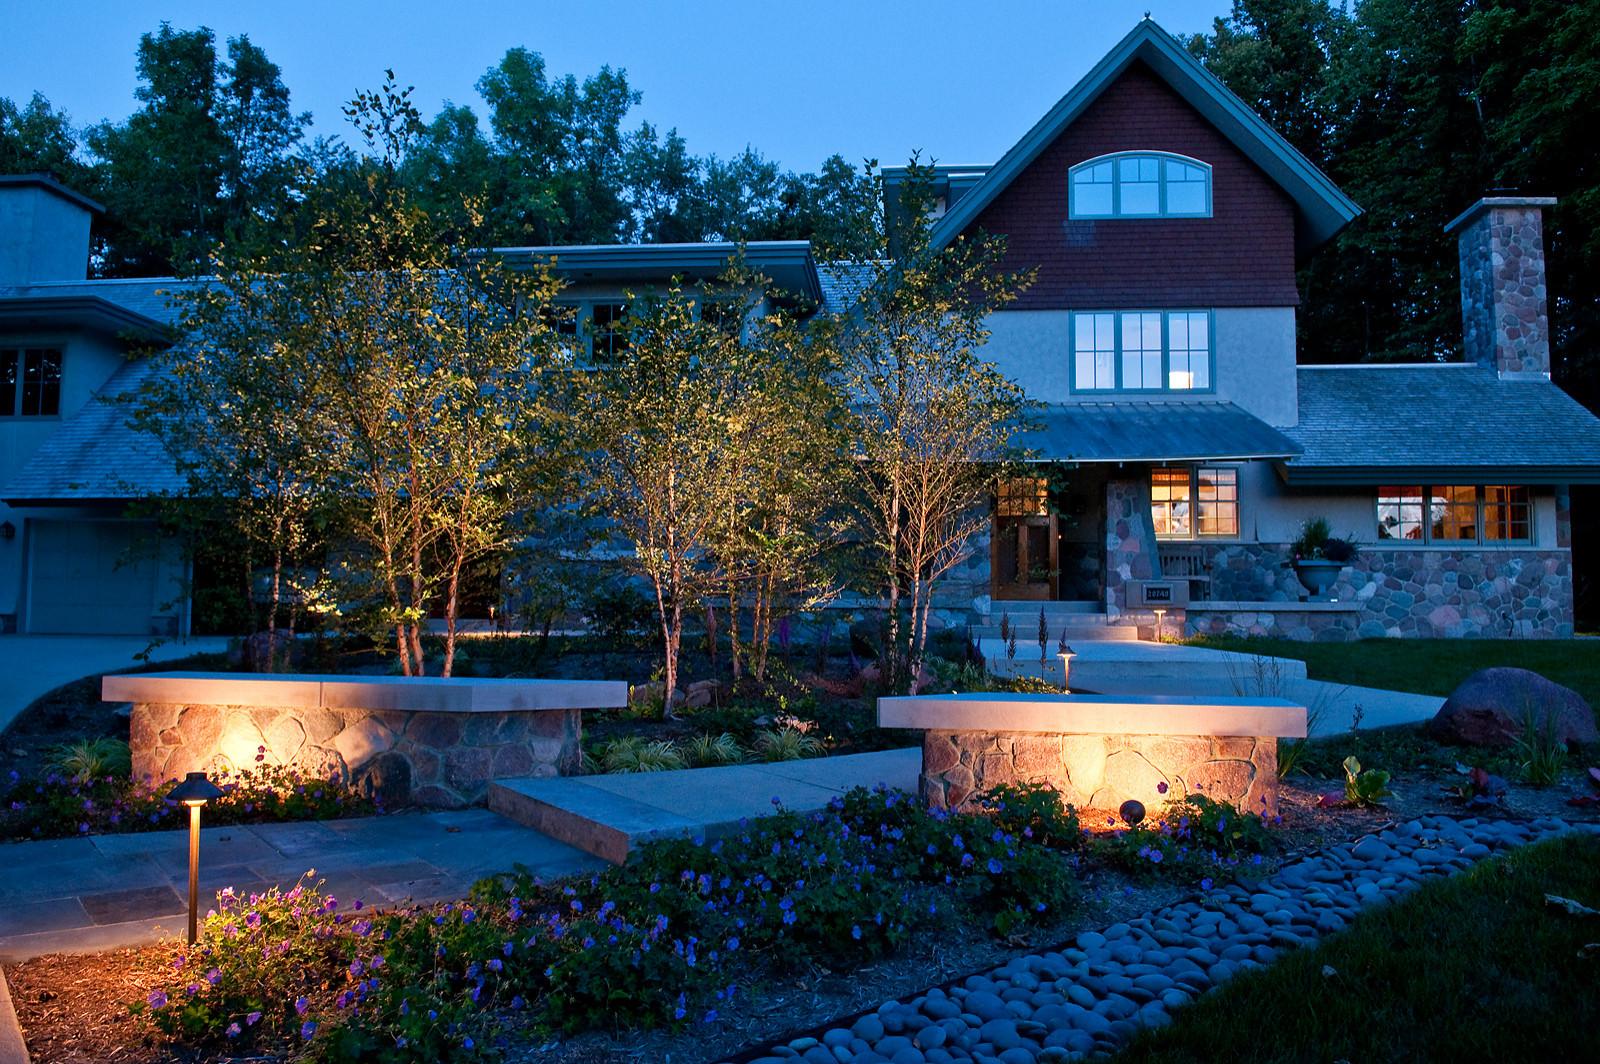 Design Book - Garden Lighting Design (2013)